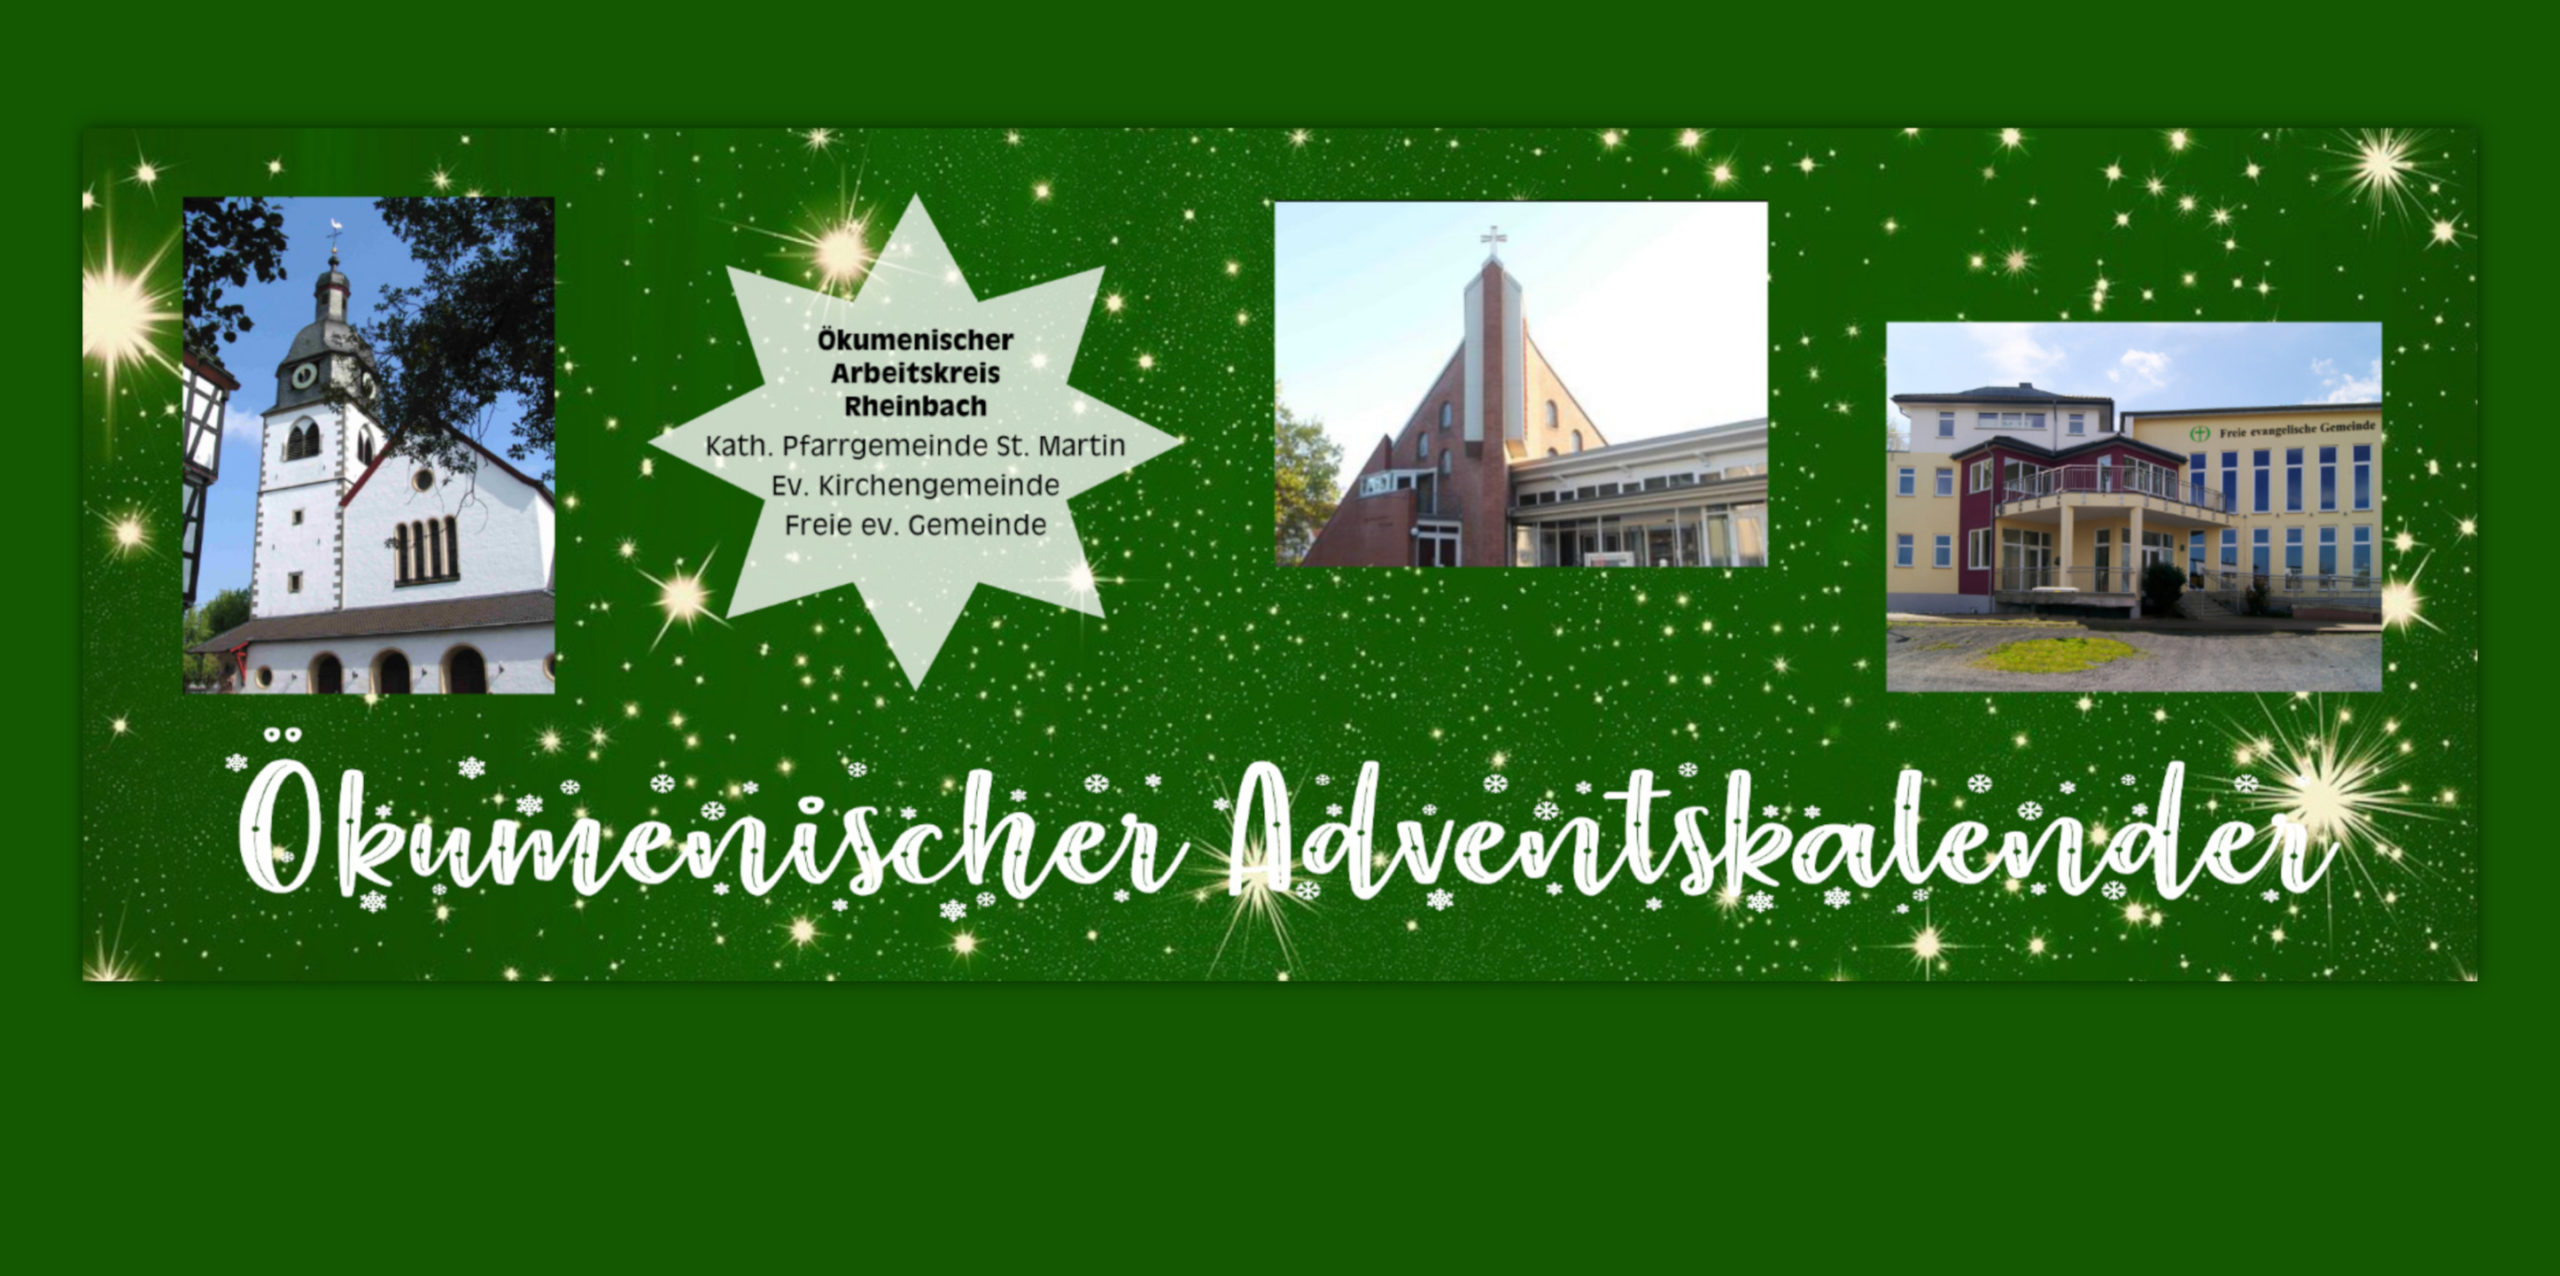 You are currently viewing Ökumenischer Adventskalender 2020